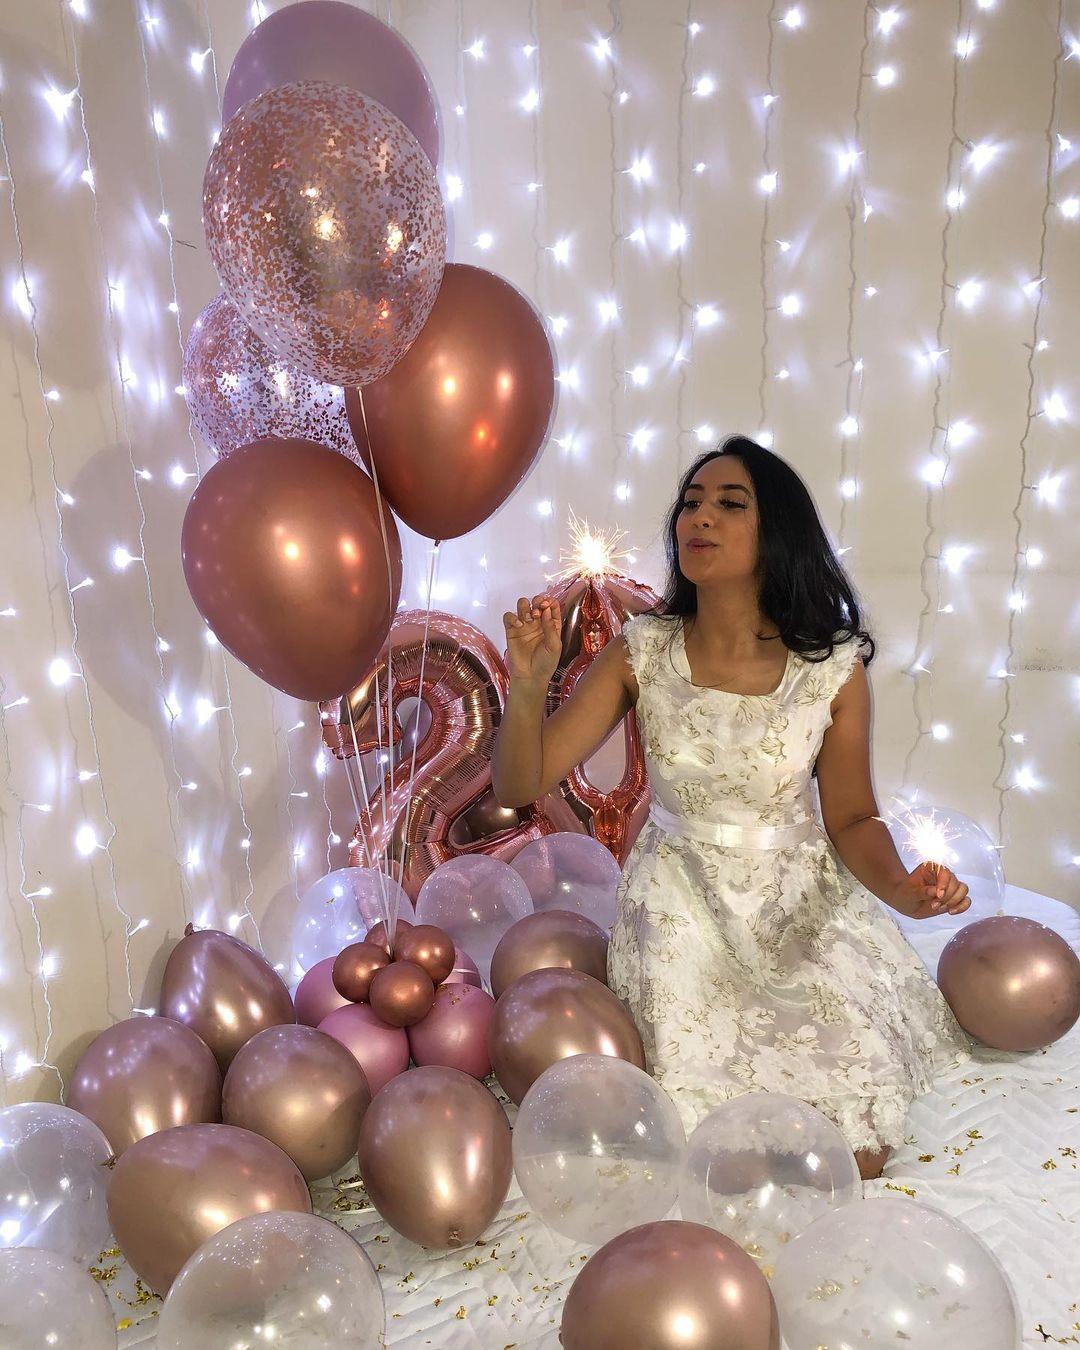 sandy menezes, miss grande sao paulo mundo 2019. - Página 4 Fma98g10